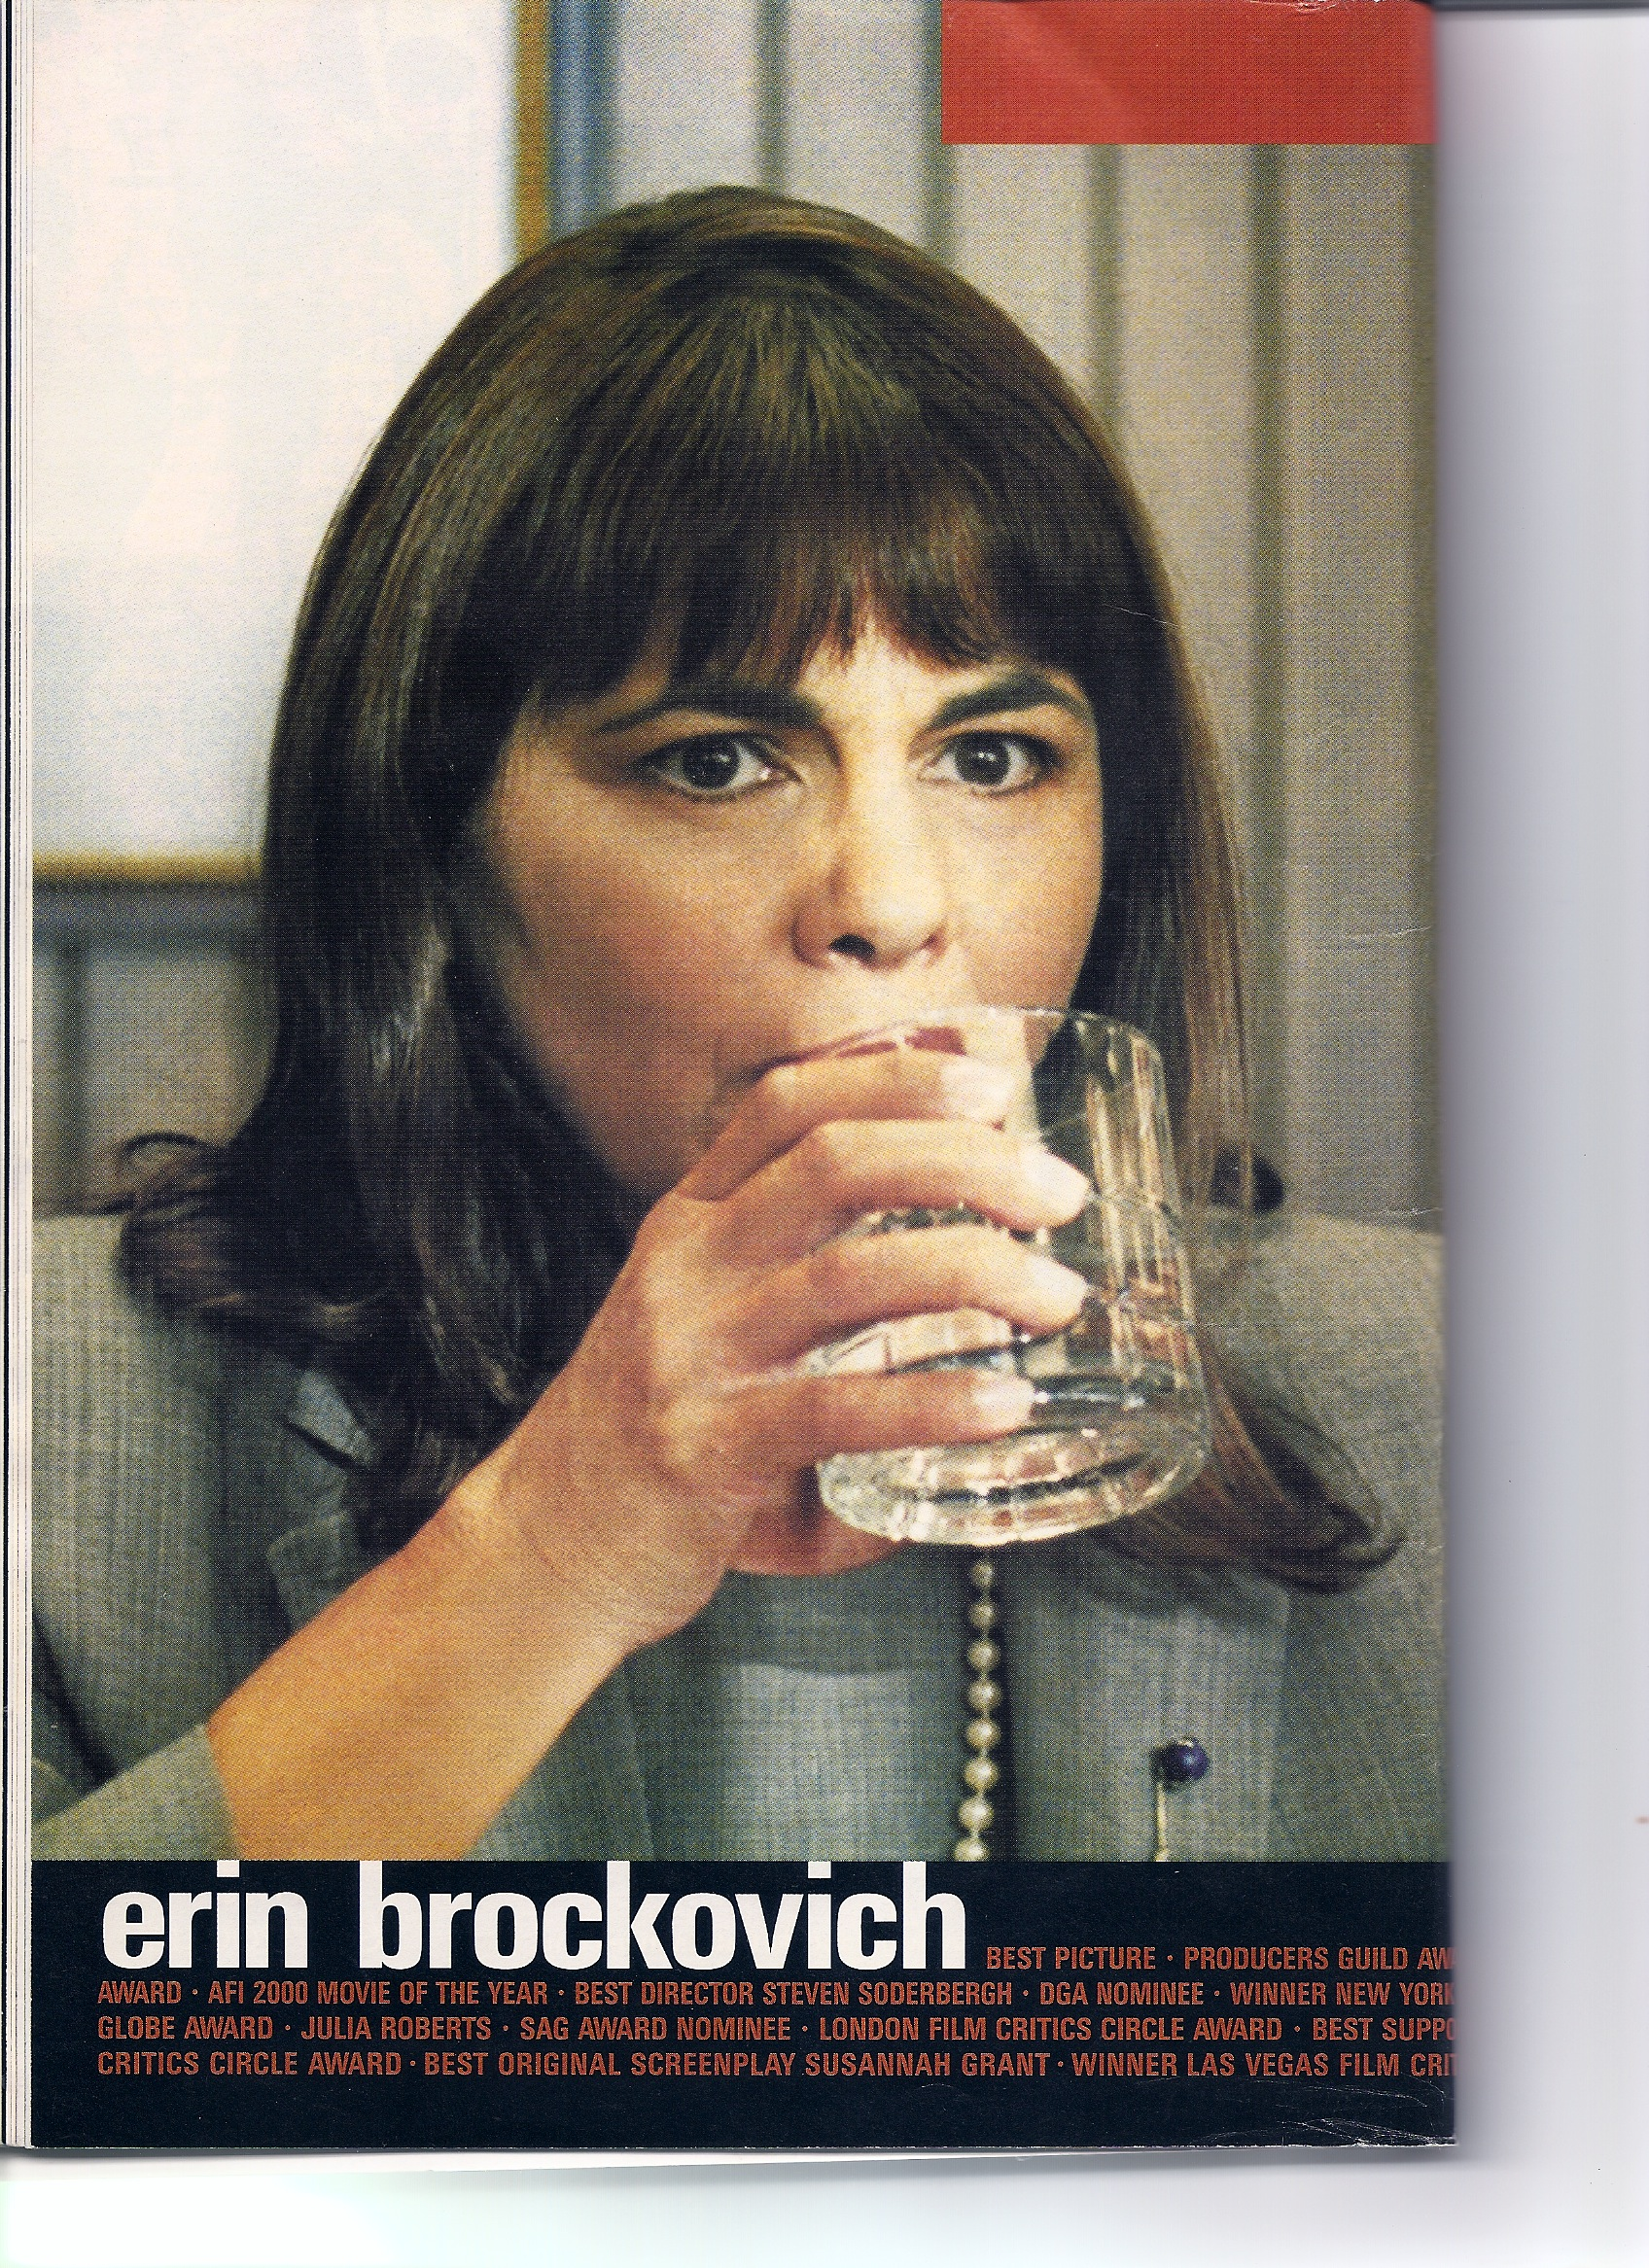 Gina Gallego in Erin Brockovich (2000)